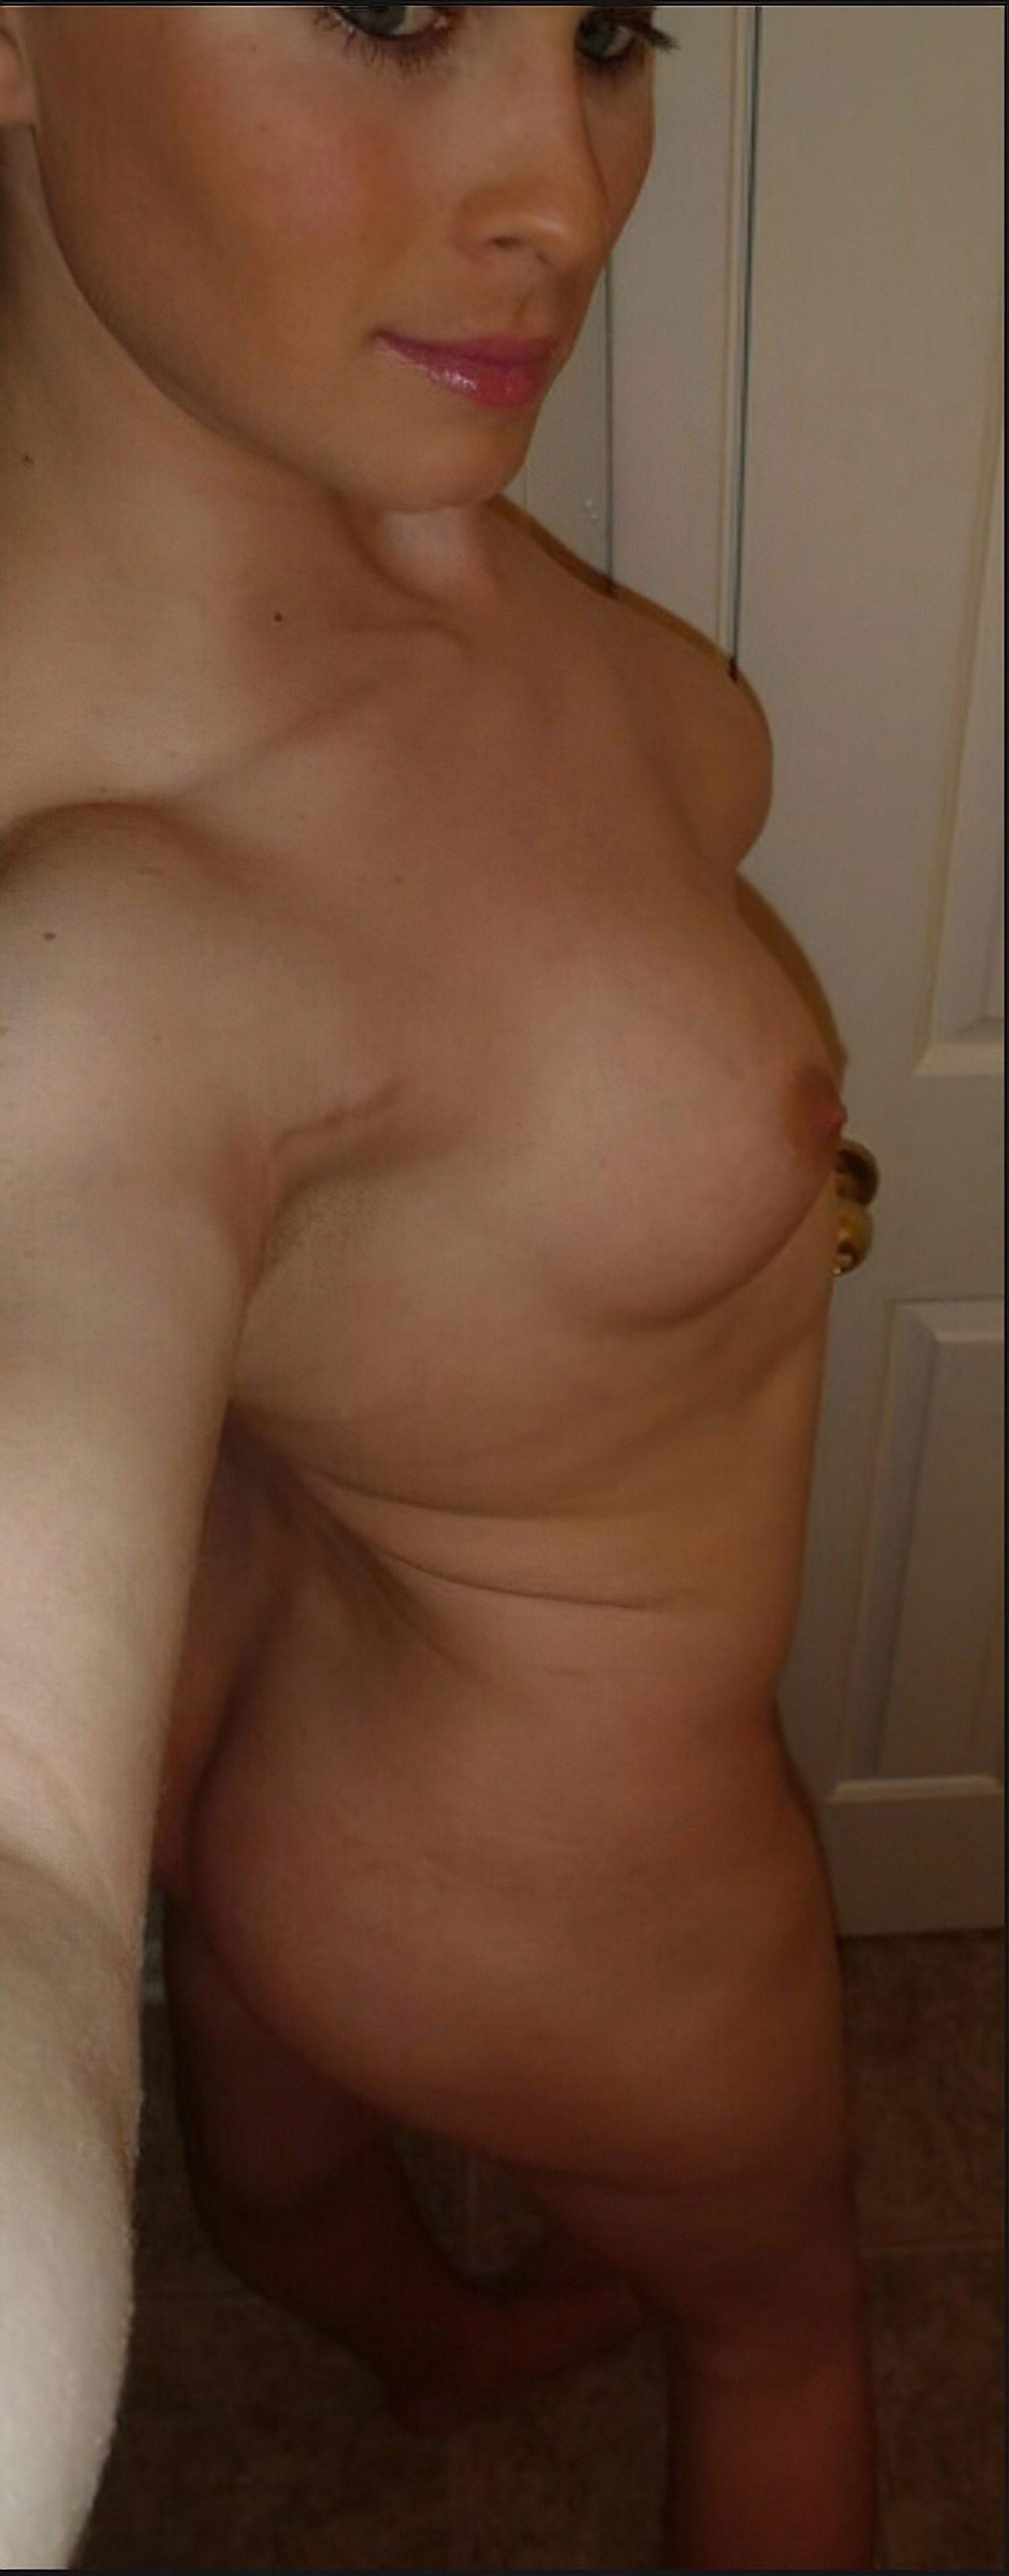 Travesti Amadora com Corpo Natural (4)